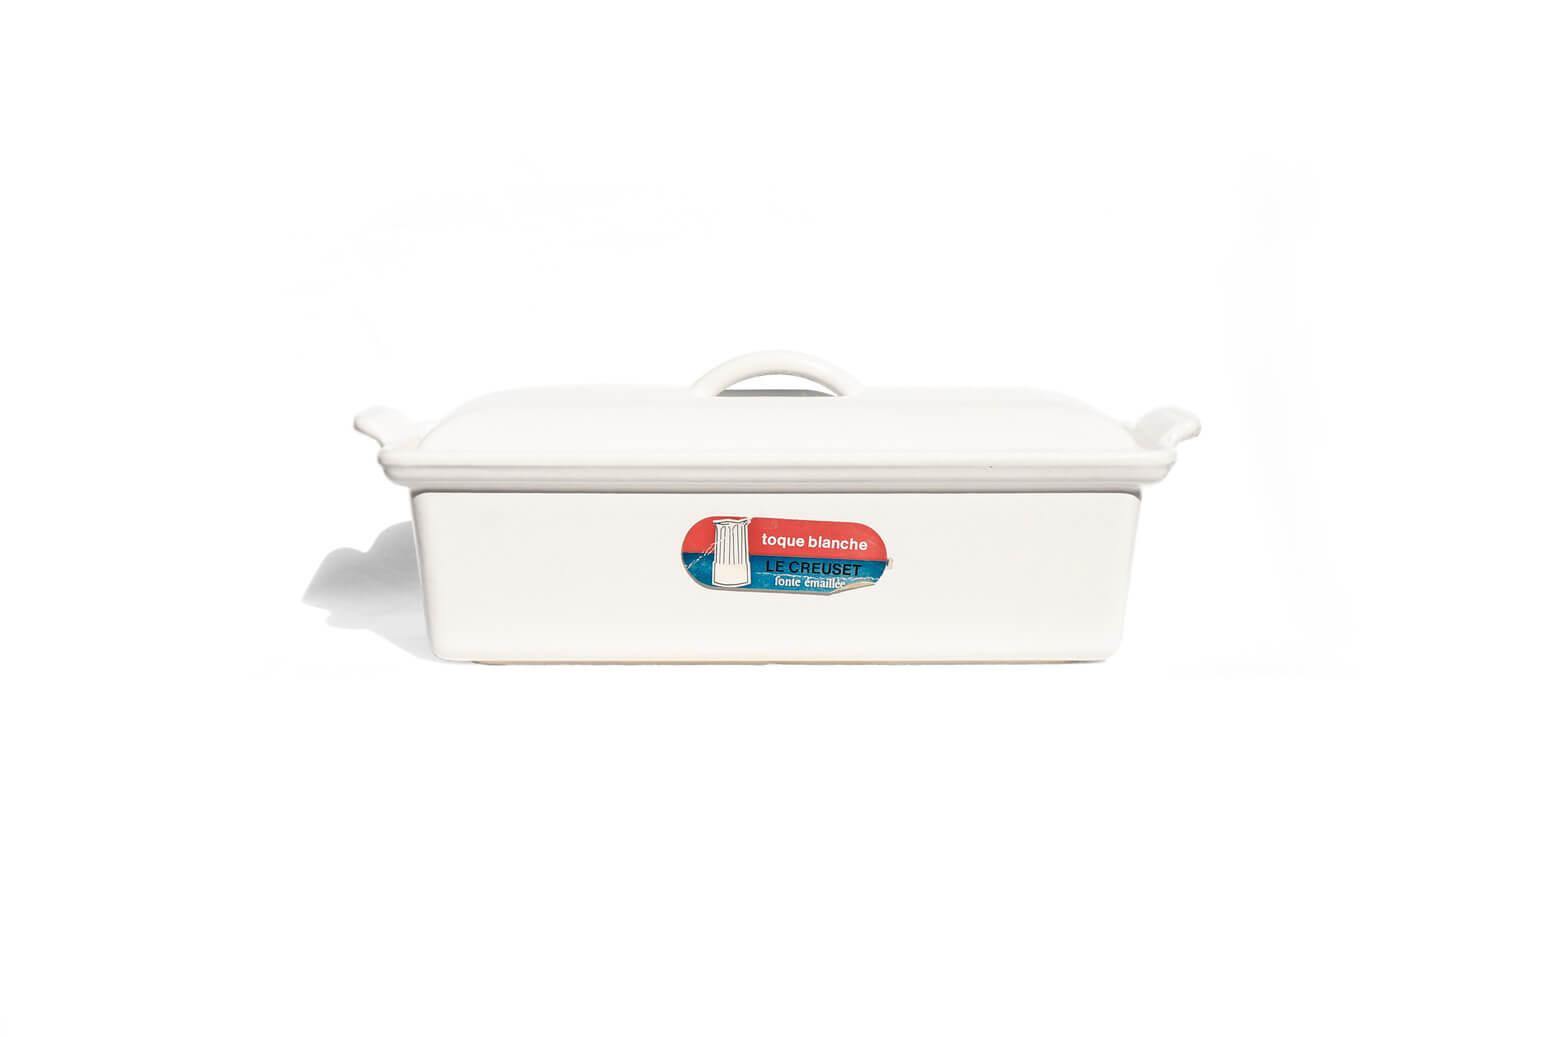 Le Creuset Terrine 28cm/ルクルーゼ テリーヌ レクタ ホワイト ヴィンテージ キッチン雑貨 廃盤